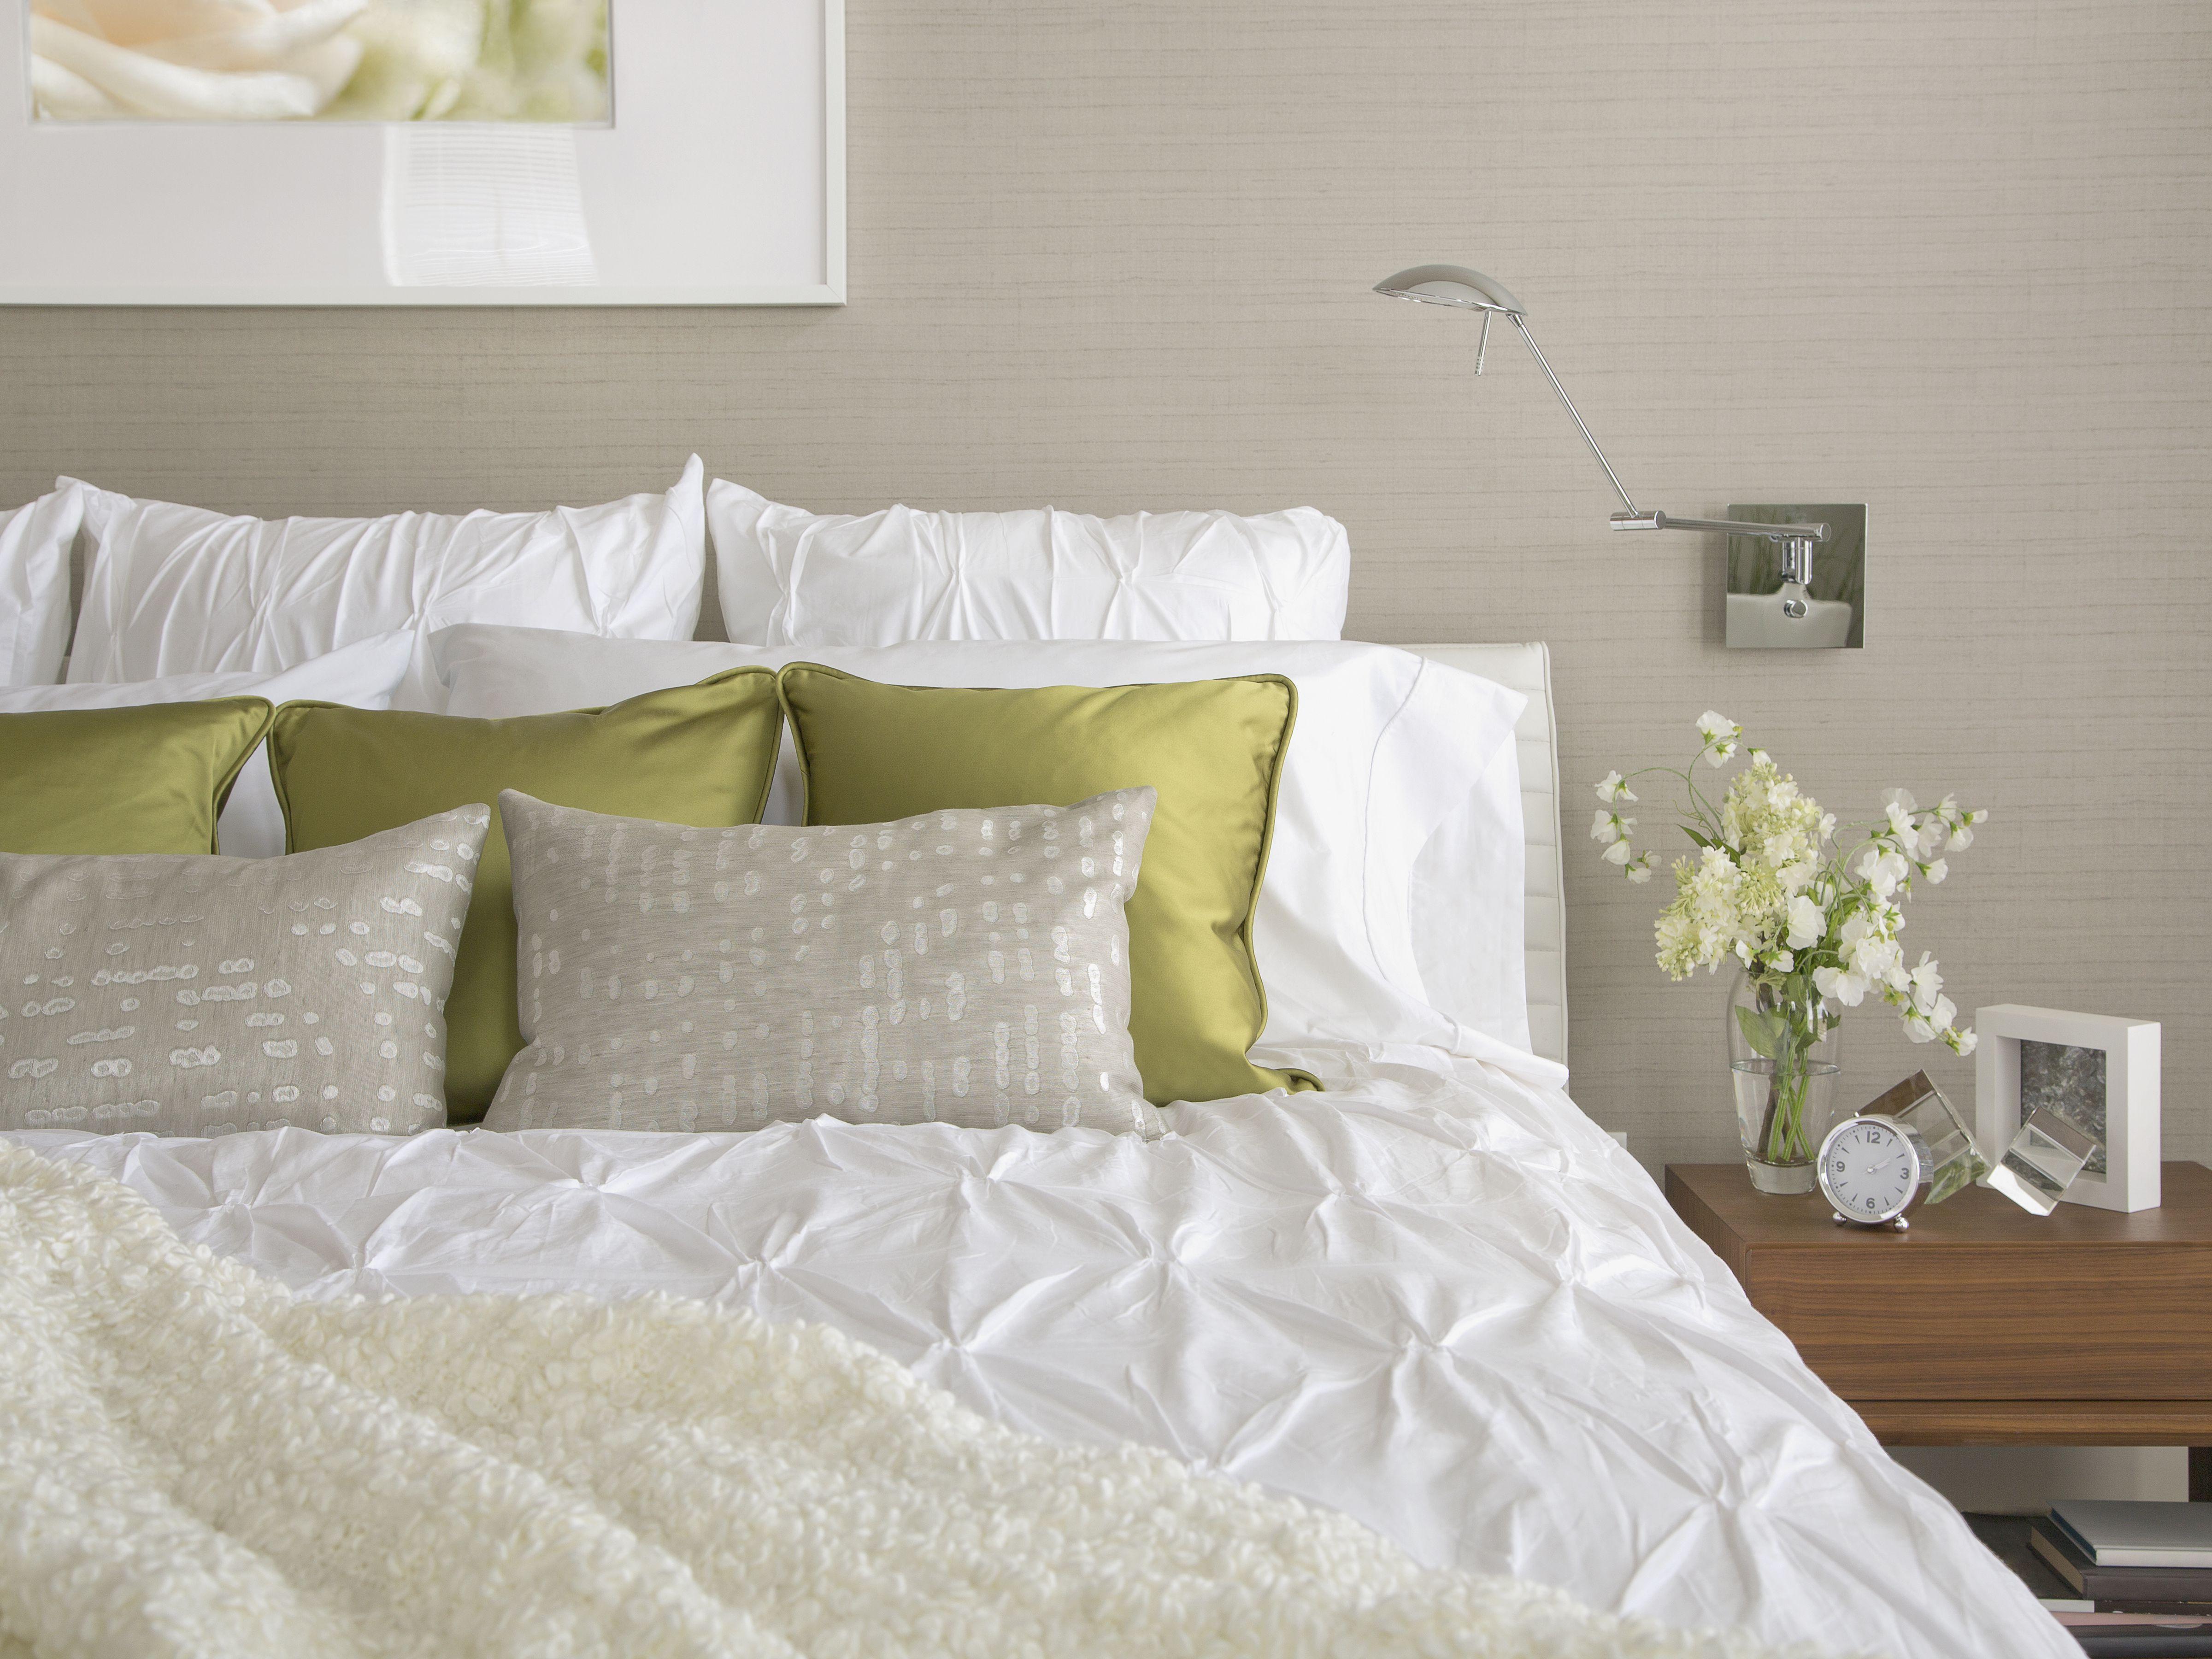 large decorative sofa pillows large sofa pillows sofa.htm what to do with throw pillows at night  what to do with throw pillows at night